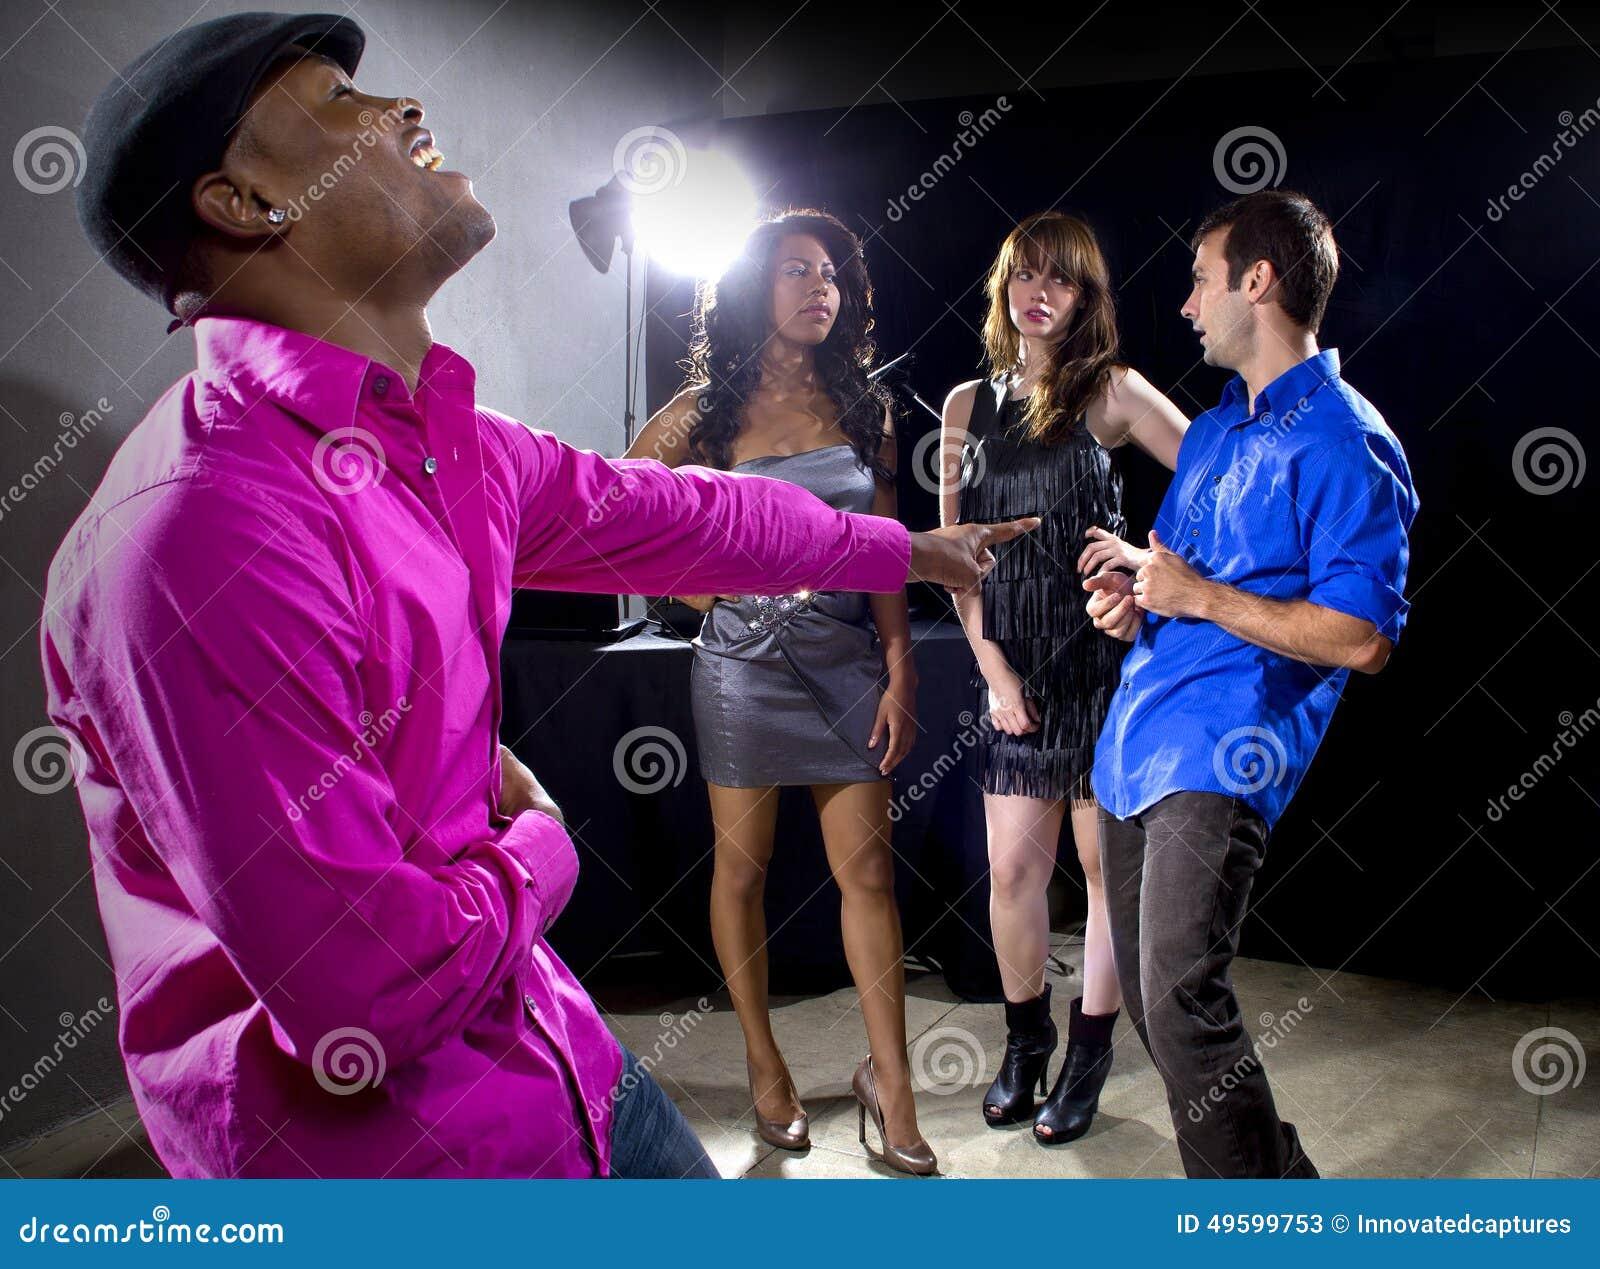 [Image: getting-rejected-girls-nightclub-laughin...599753.jpg]